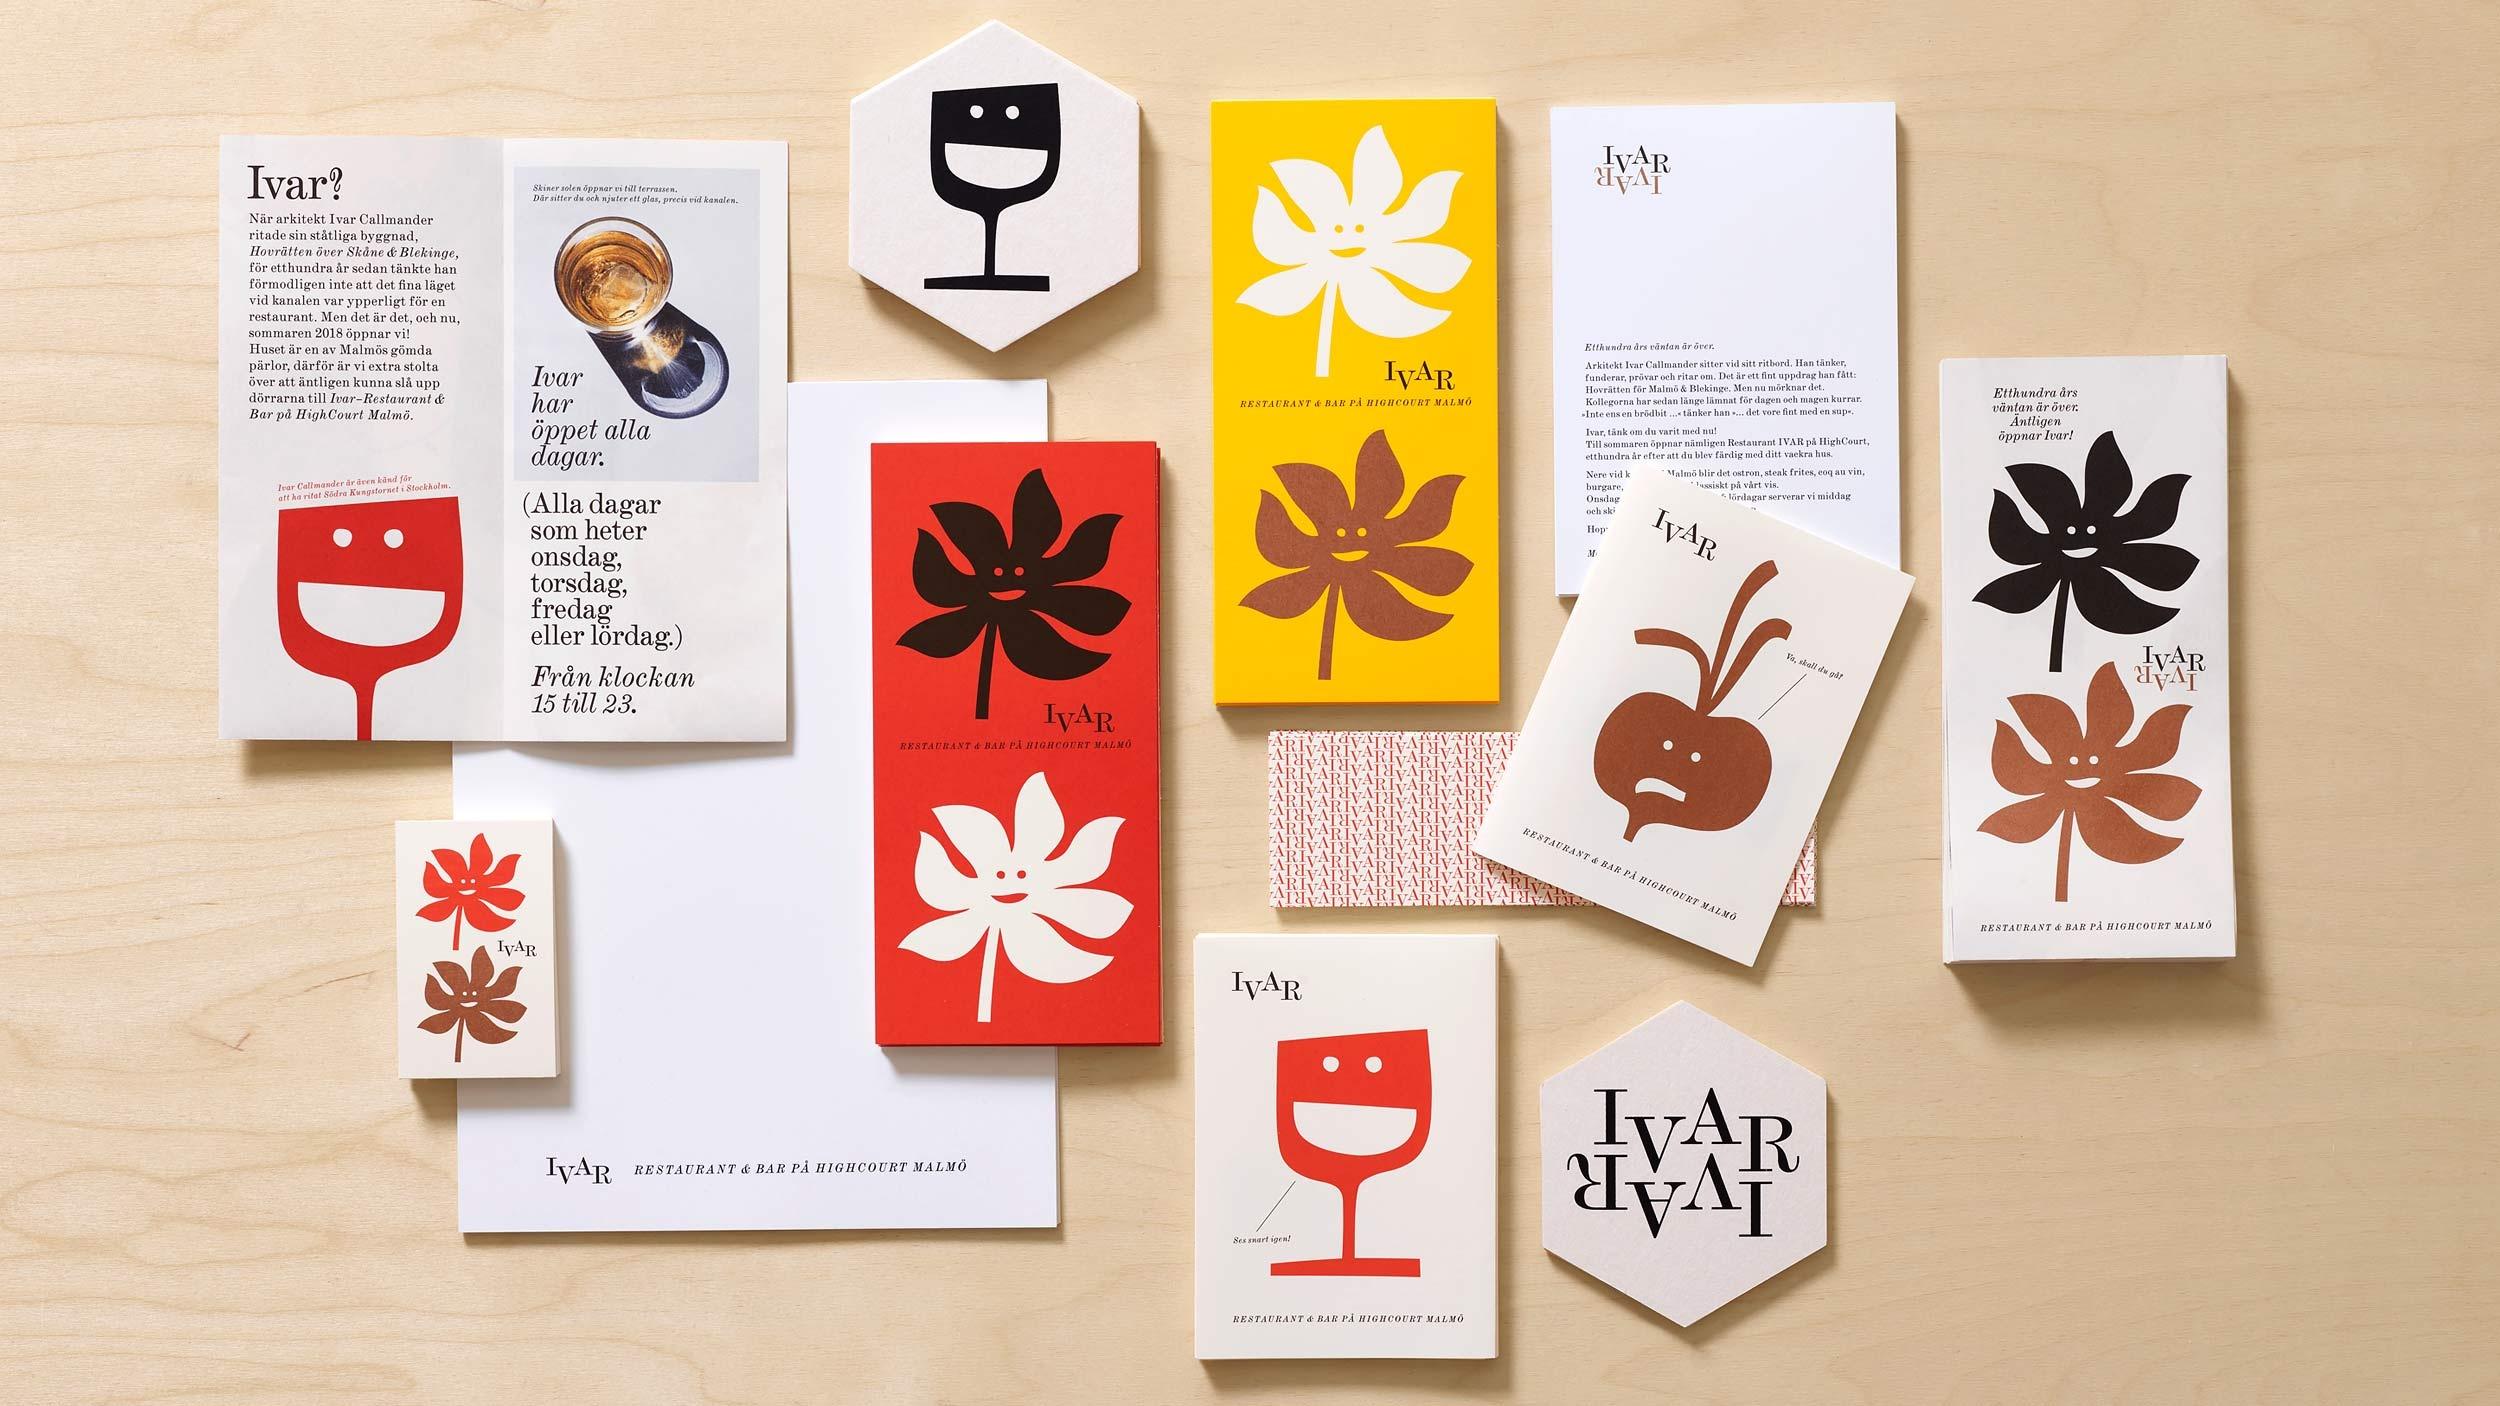 Ivar Restaurant – graphic identity